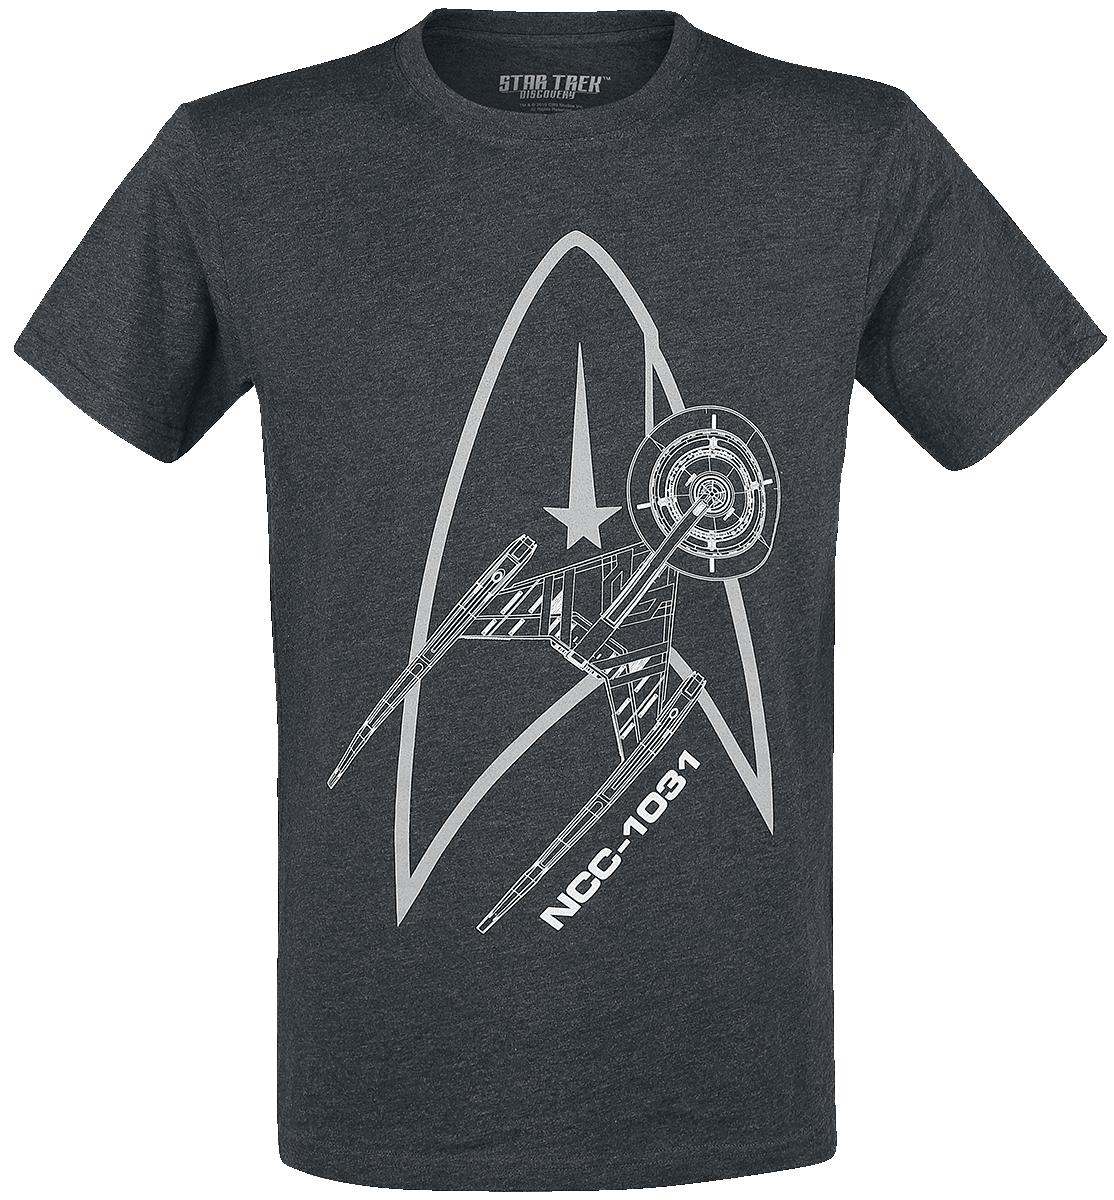 Star Trek - Discovery - NCC 1031 - T-Shirt - charcoal image